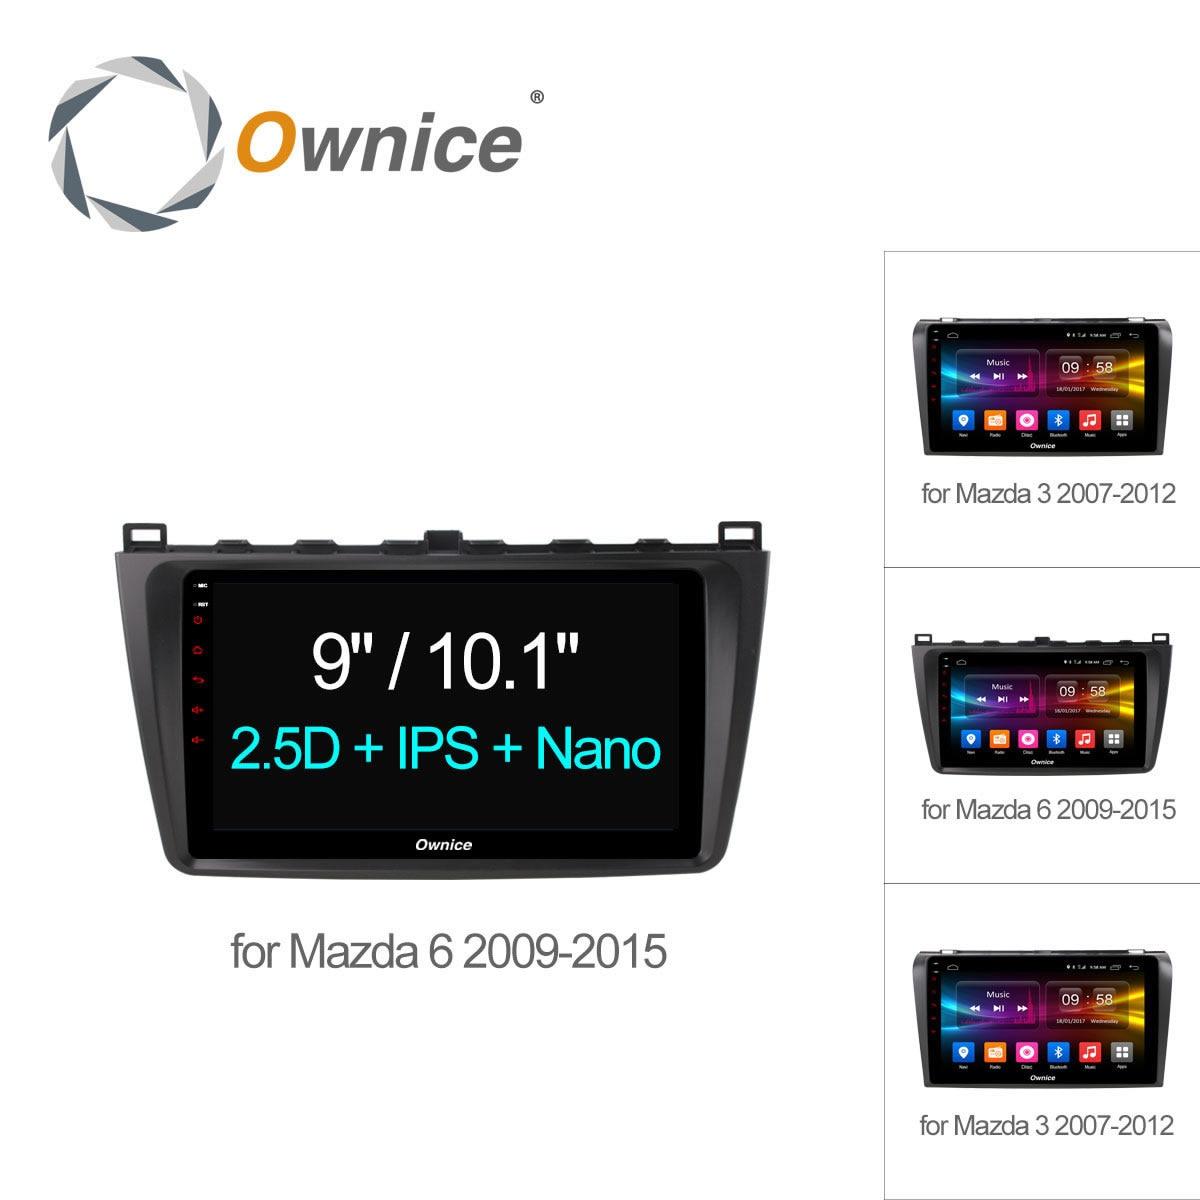 9 ownice C500 + Android 6.0 dvd-плеер автомобиля GPS для Mazda 3 Mazda 6 Авторадио Мультимедиа Восьмиядерный 4 г LTE 2 ГБ + 32 ГБ dab + Радио RDS